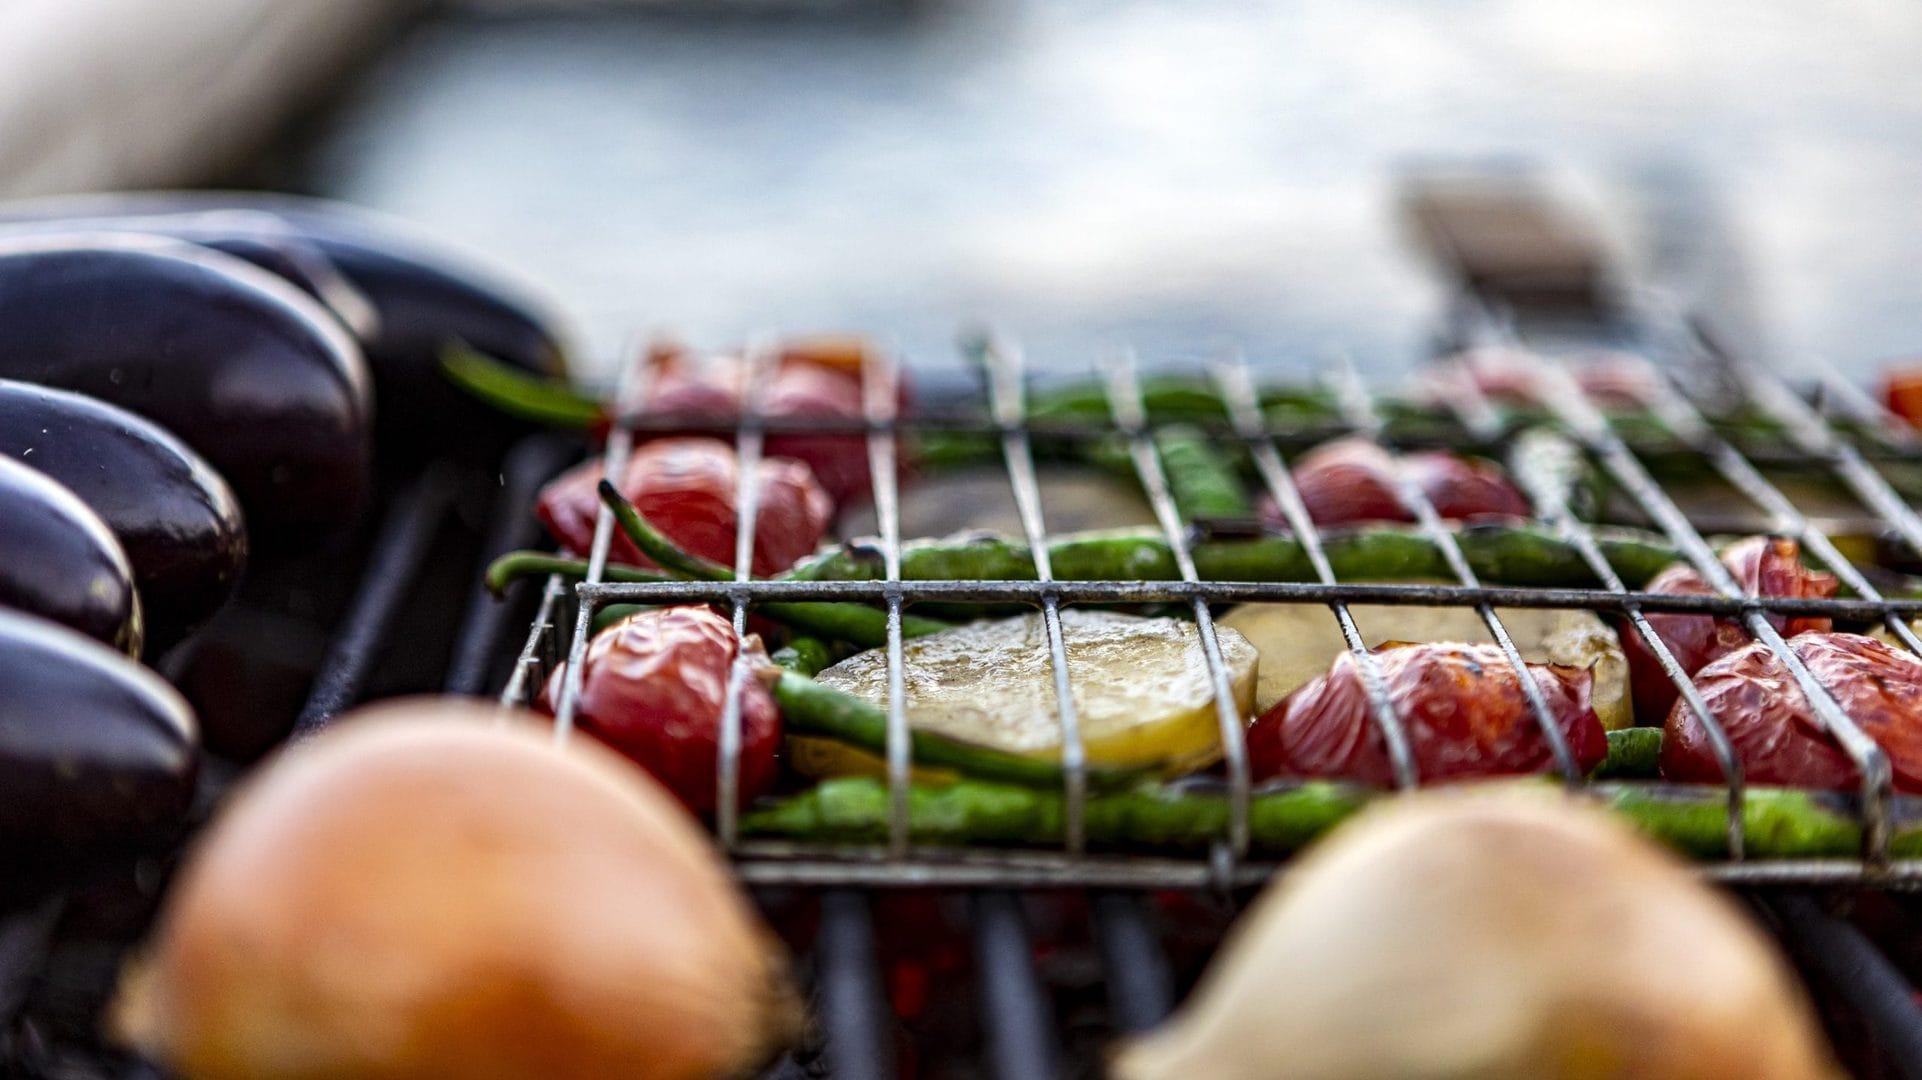 groene asperges, aardappeltjes, tomaten, uien en aubergine op bbq